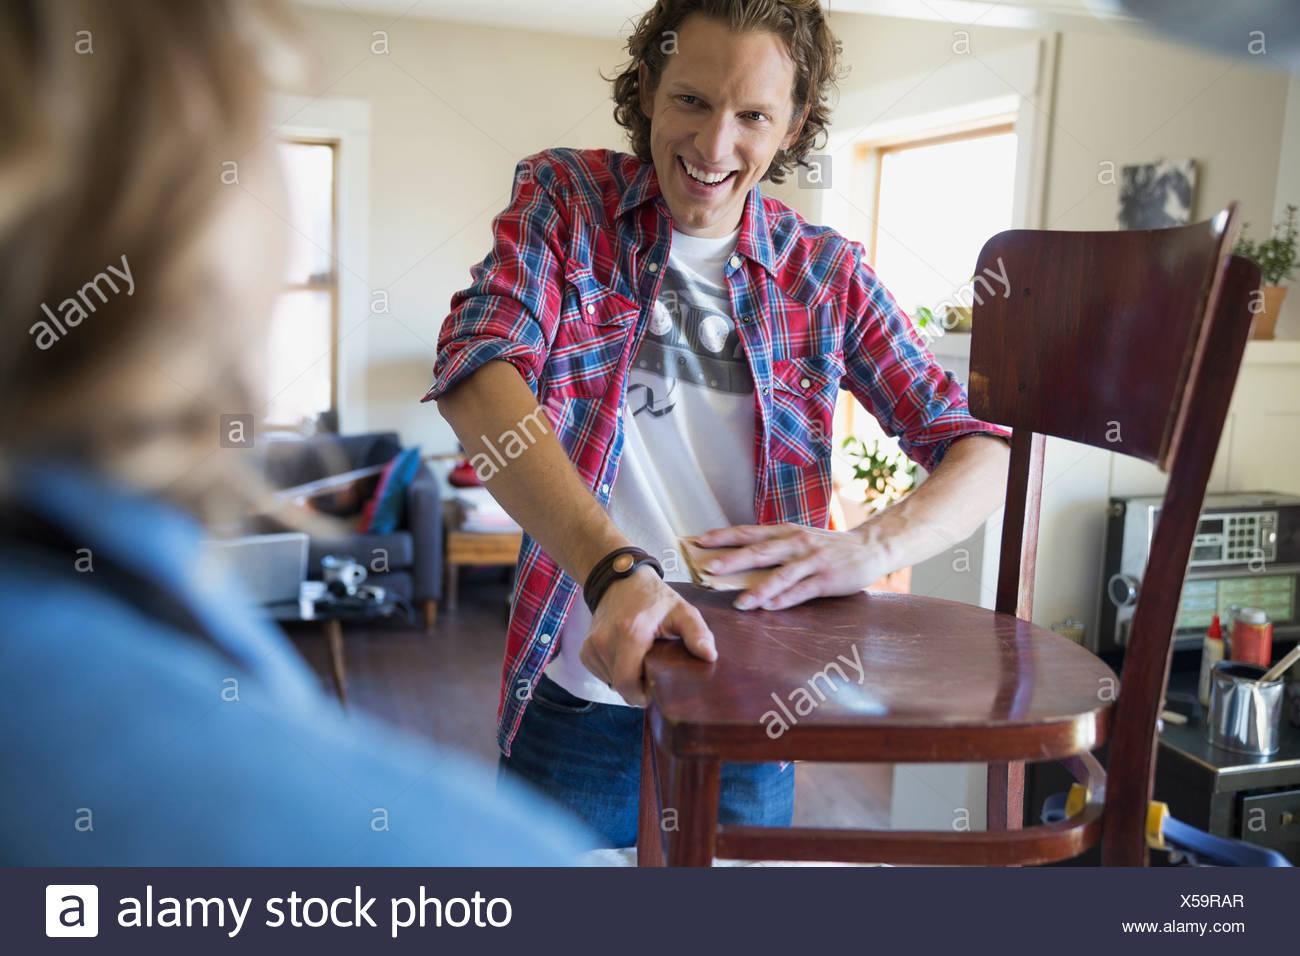 Couple refinishing chair - Stock Image